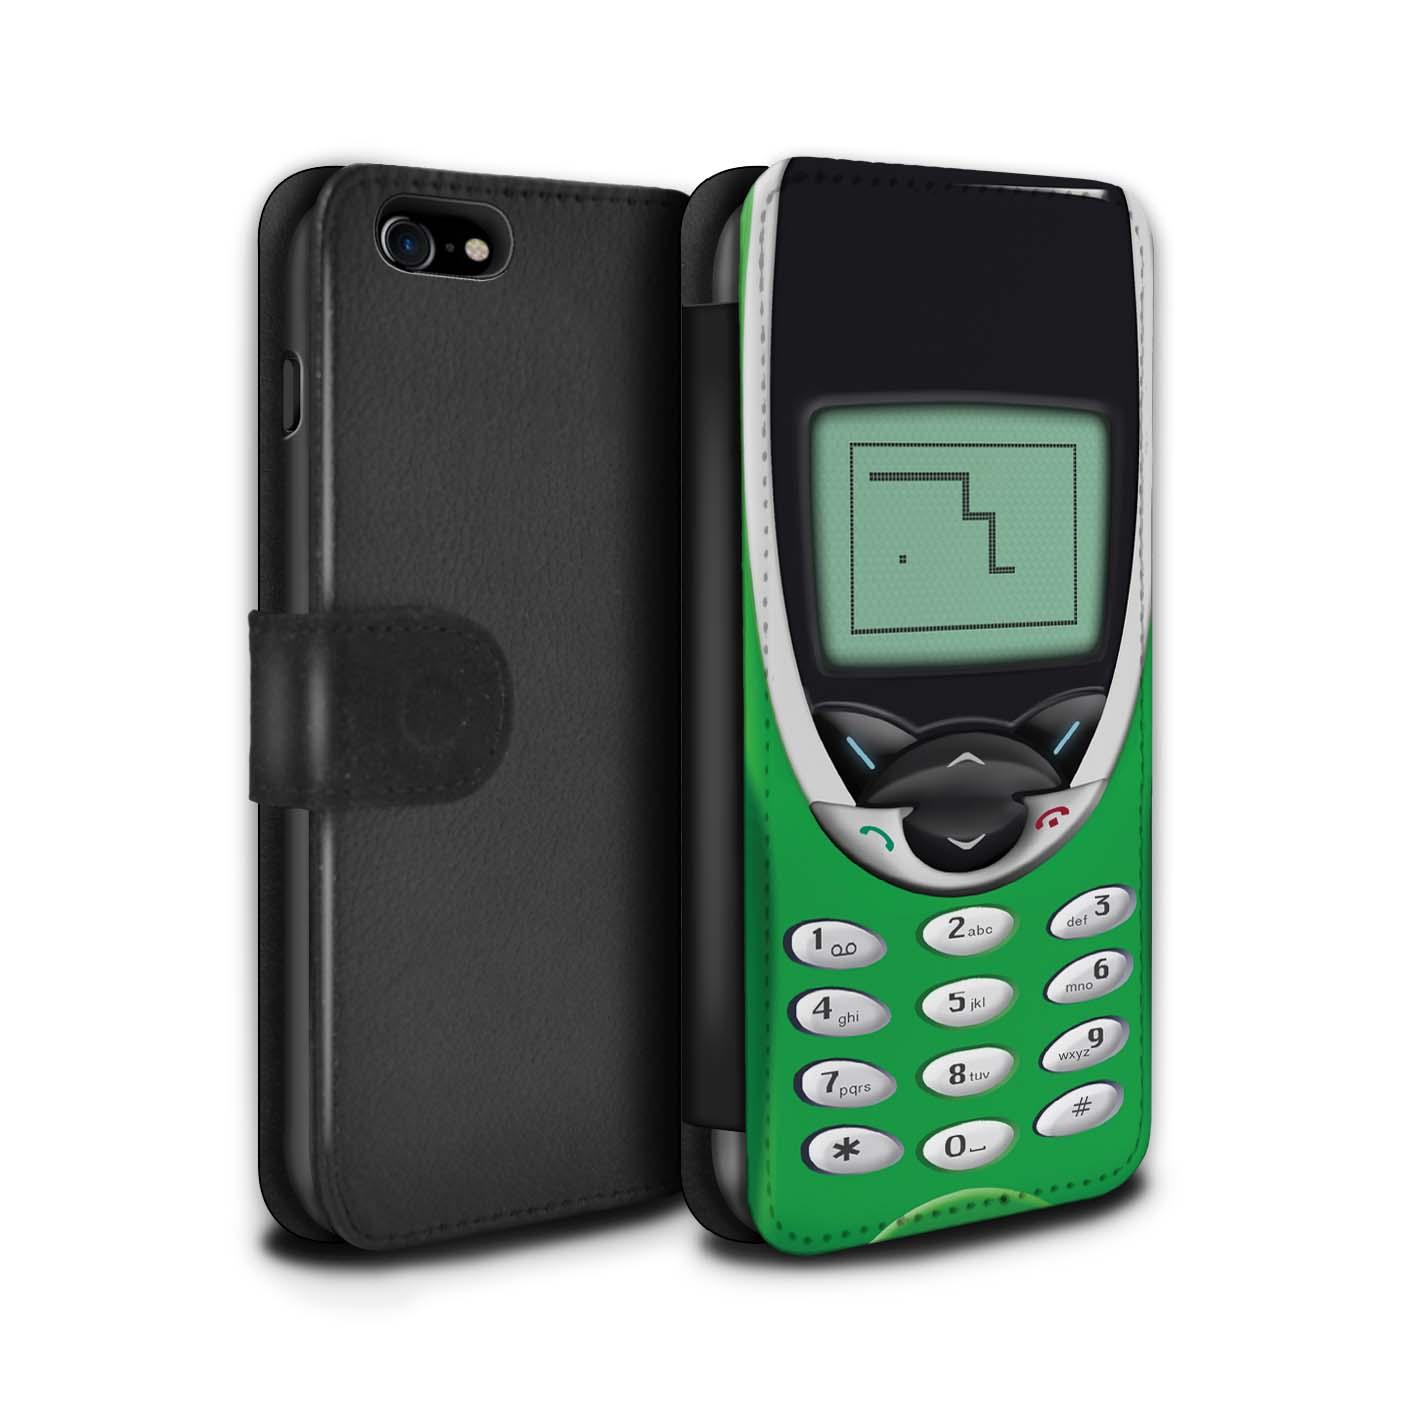 STUFF4-Coque-Etui-Case-Cuir-PU-pour-Apple-iPhone-8-Portables-retro